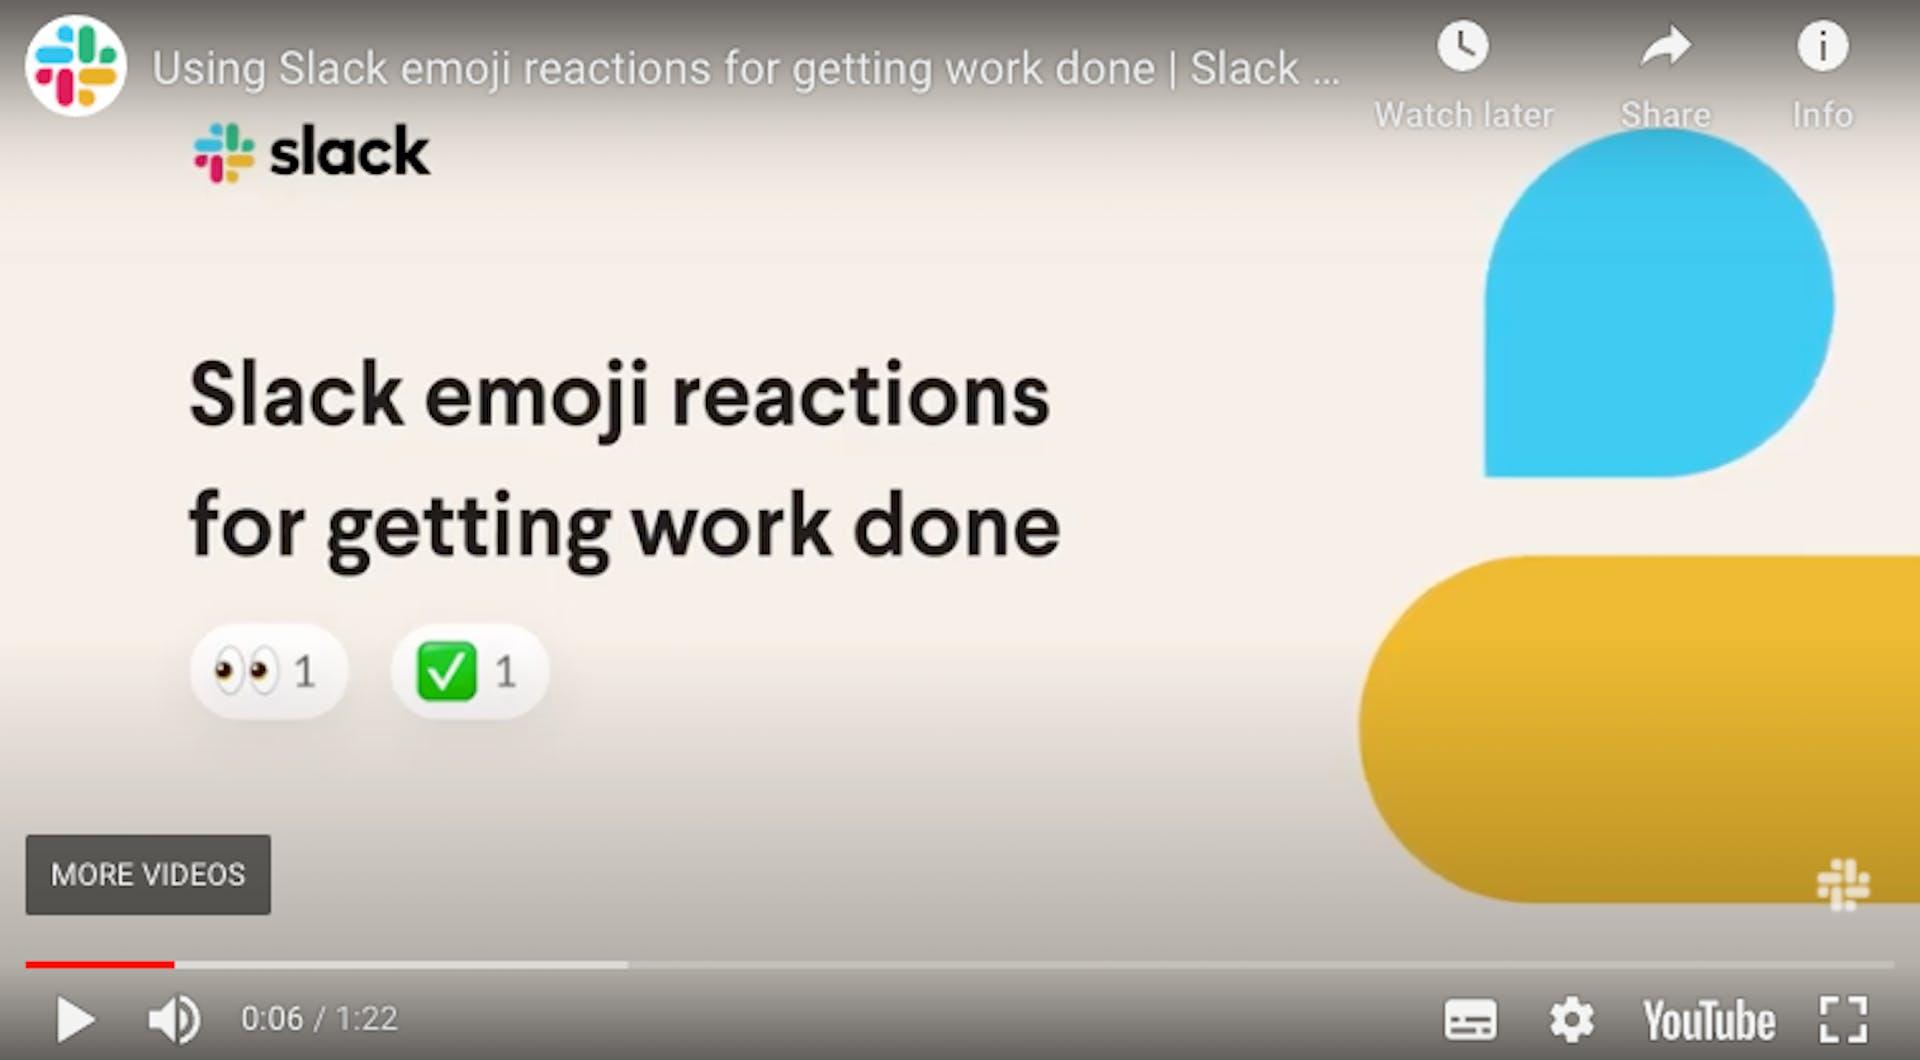 Slack's product video introduces emojis for its messaging platform